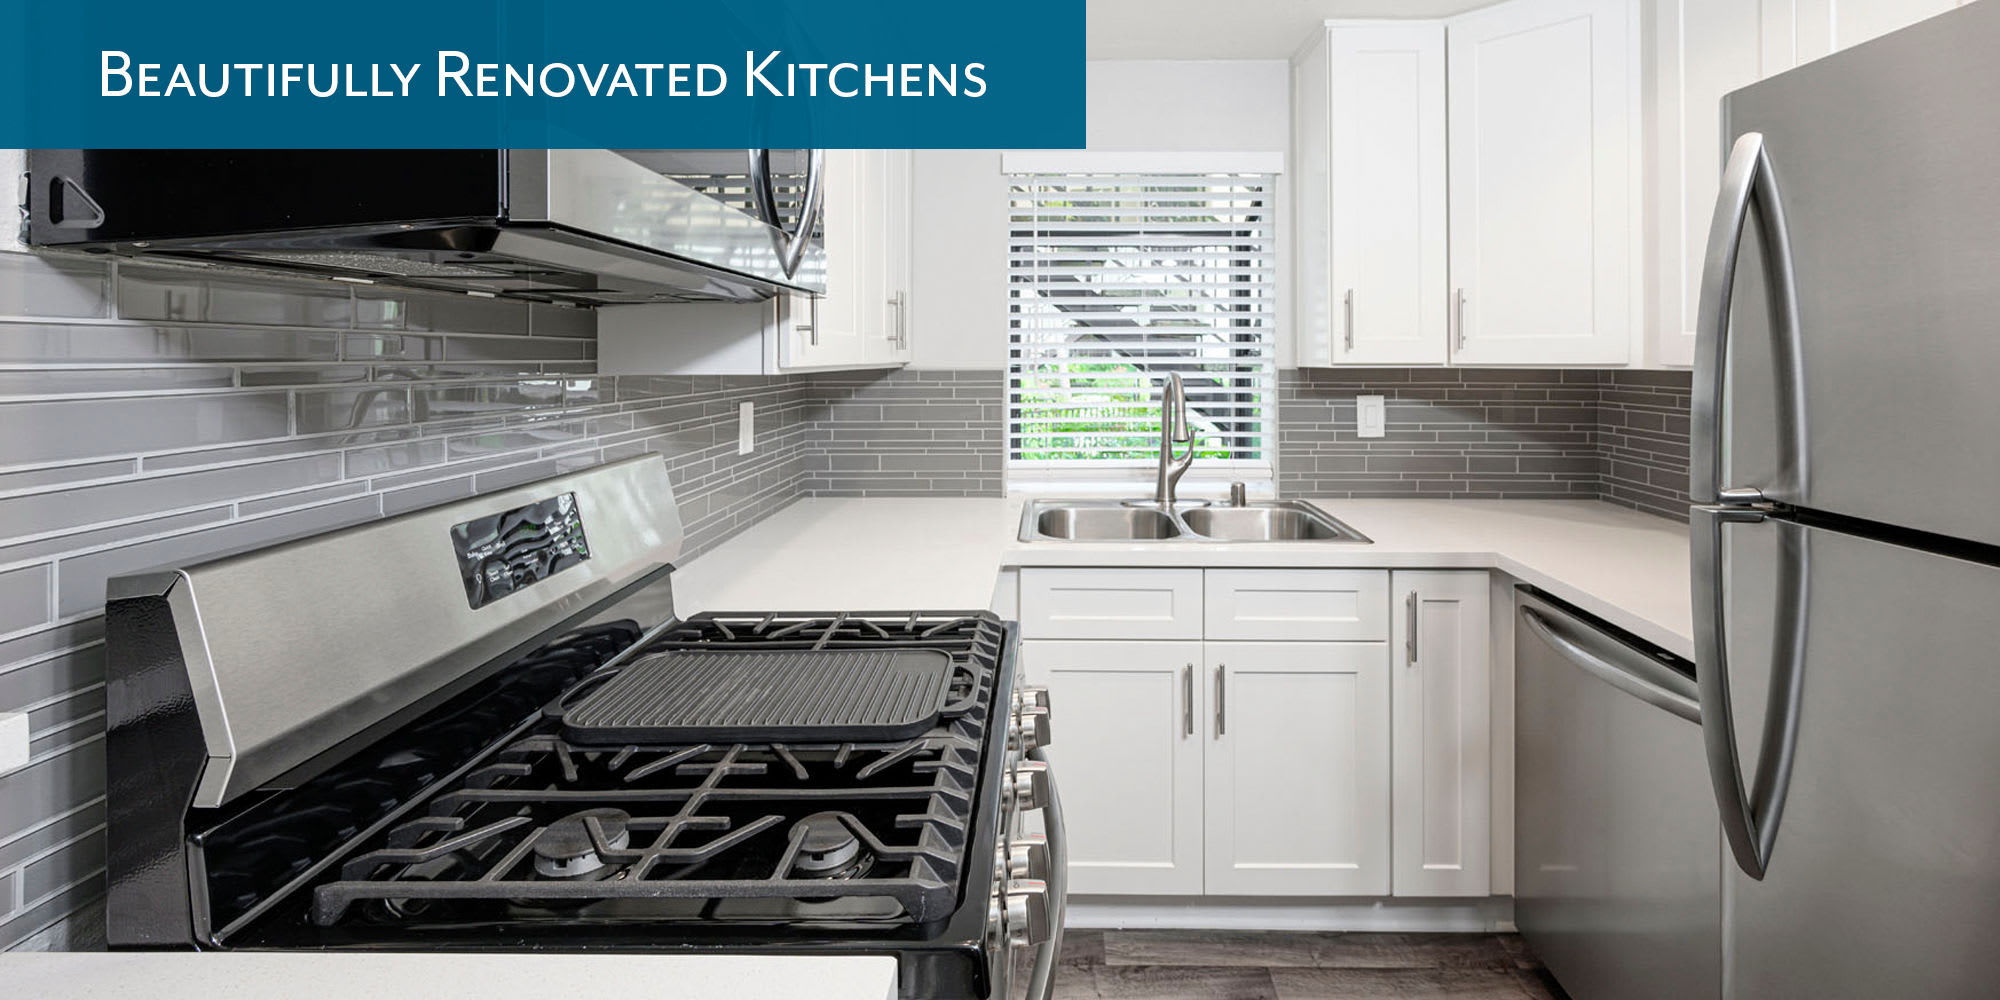 Beautifully renovated kitchens at Sendero Huntington Beach in Huntington Beach, California